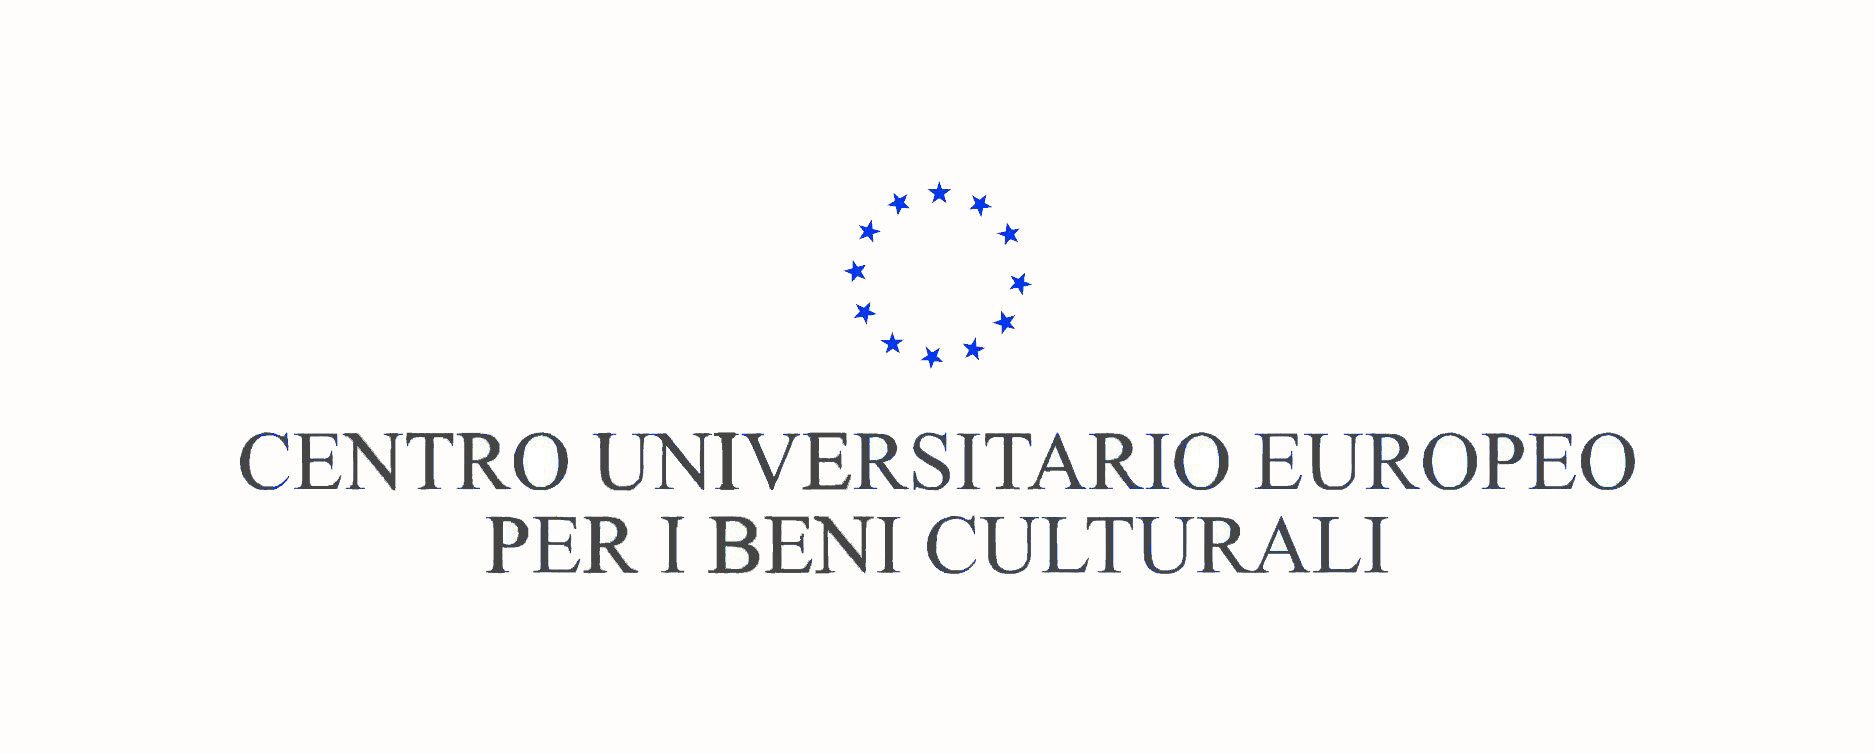 http://carnvalnetwork.blogs.upv.es/wp-content/blogs.dir/2239/files/2-logo_cue_300_DPI_scritta_grigia.jpg